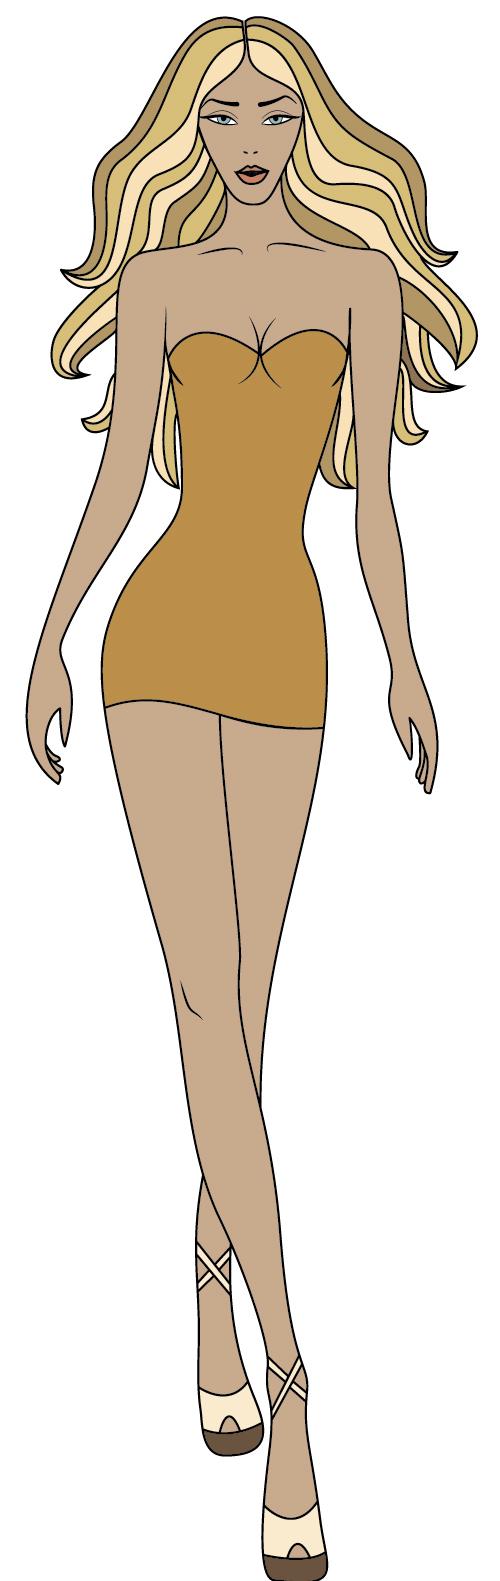 Woman in miniskirt vector